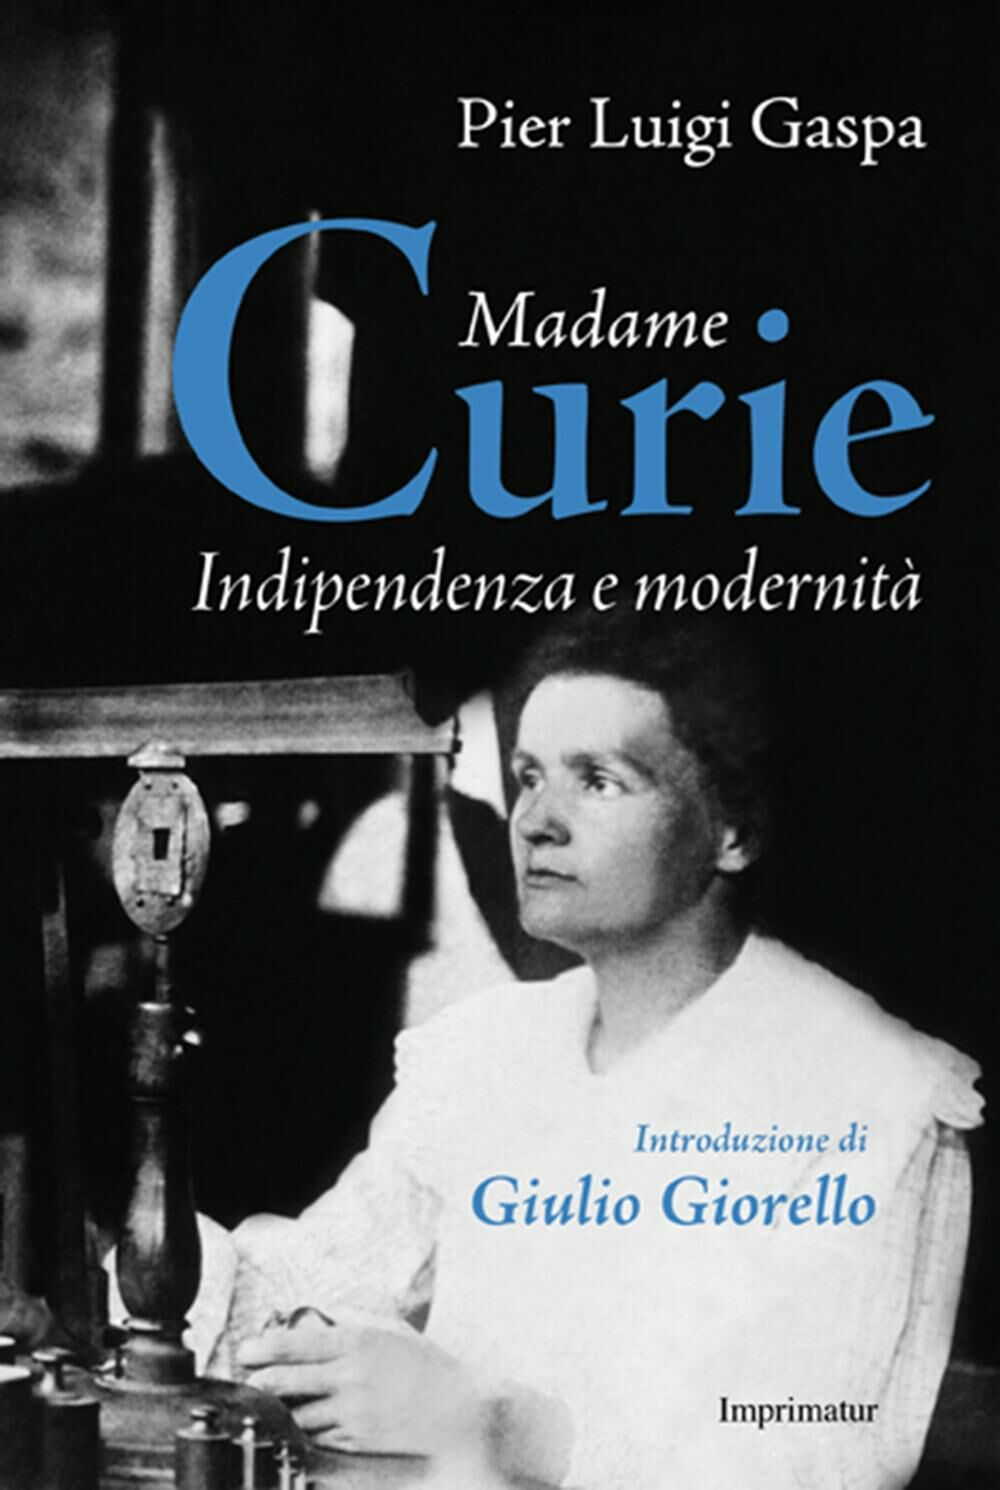 Madame Curie. Indipendenza e modernità